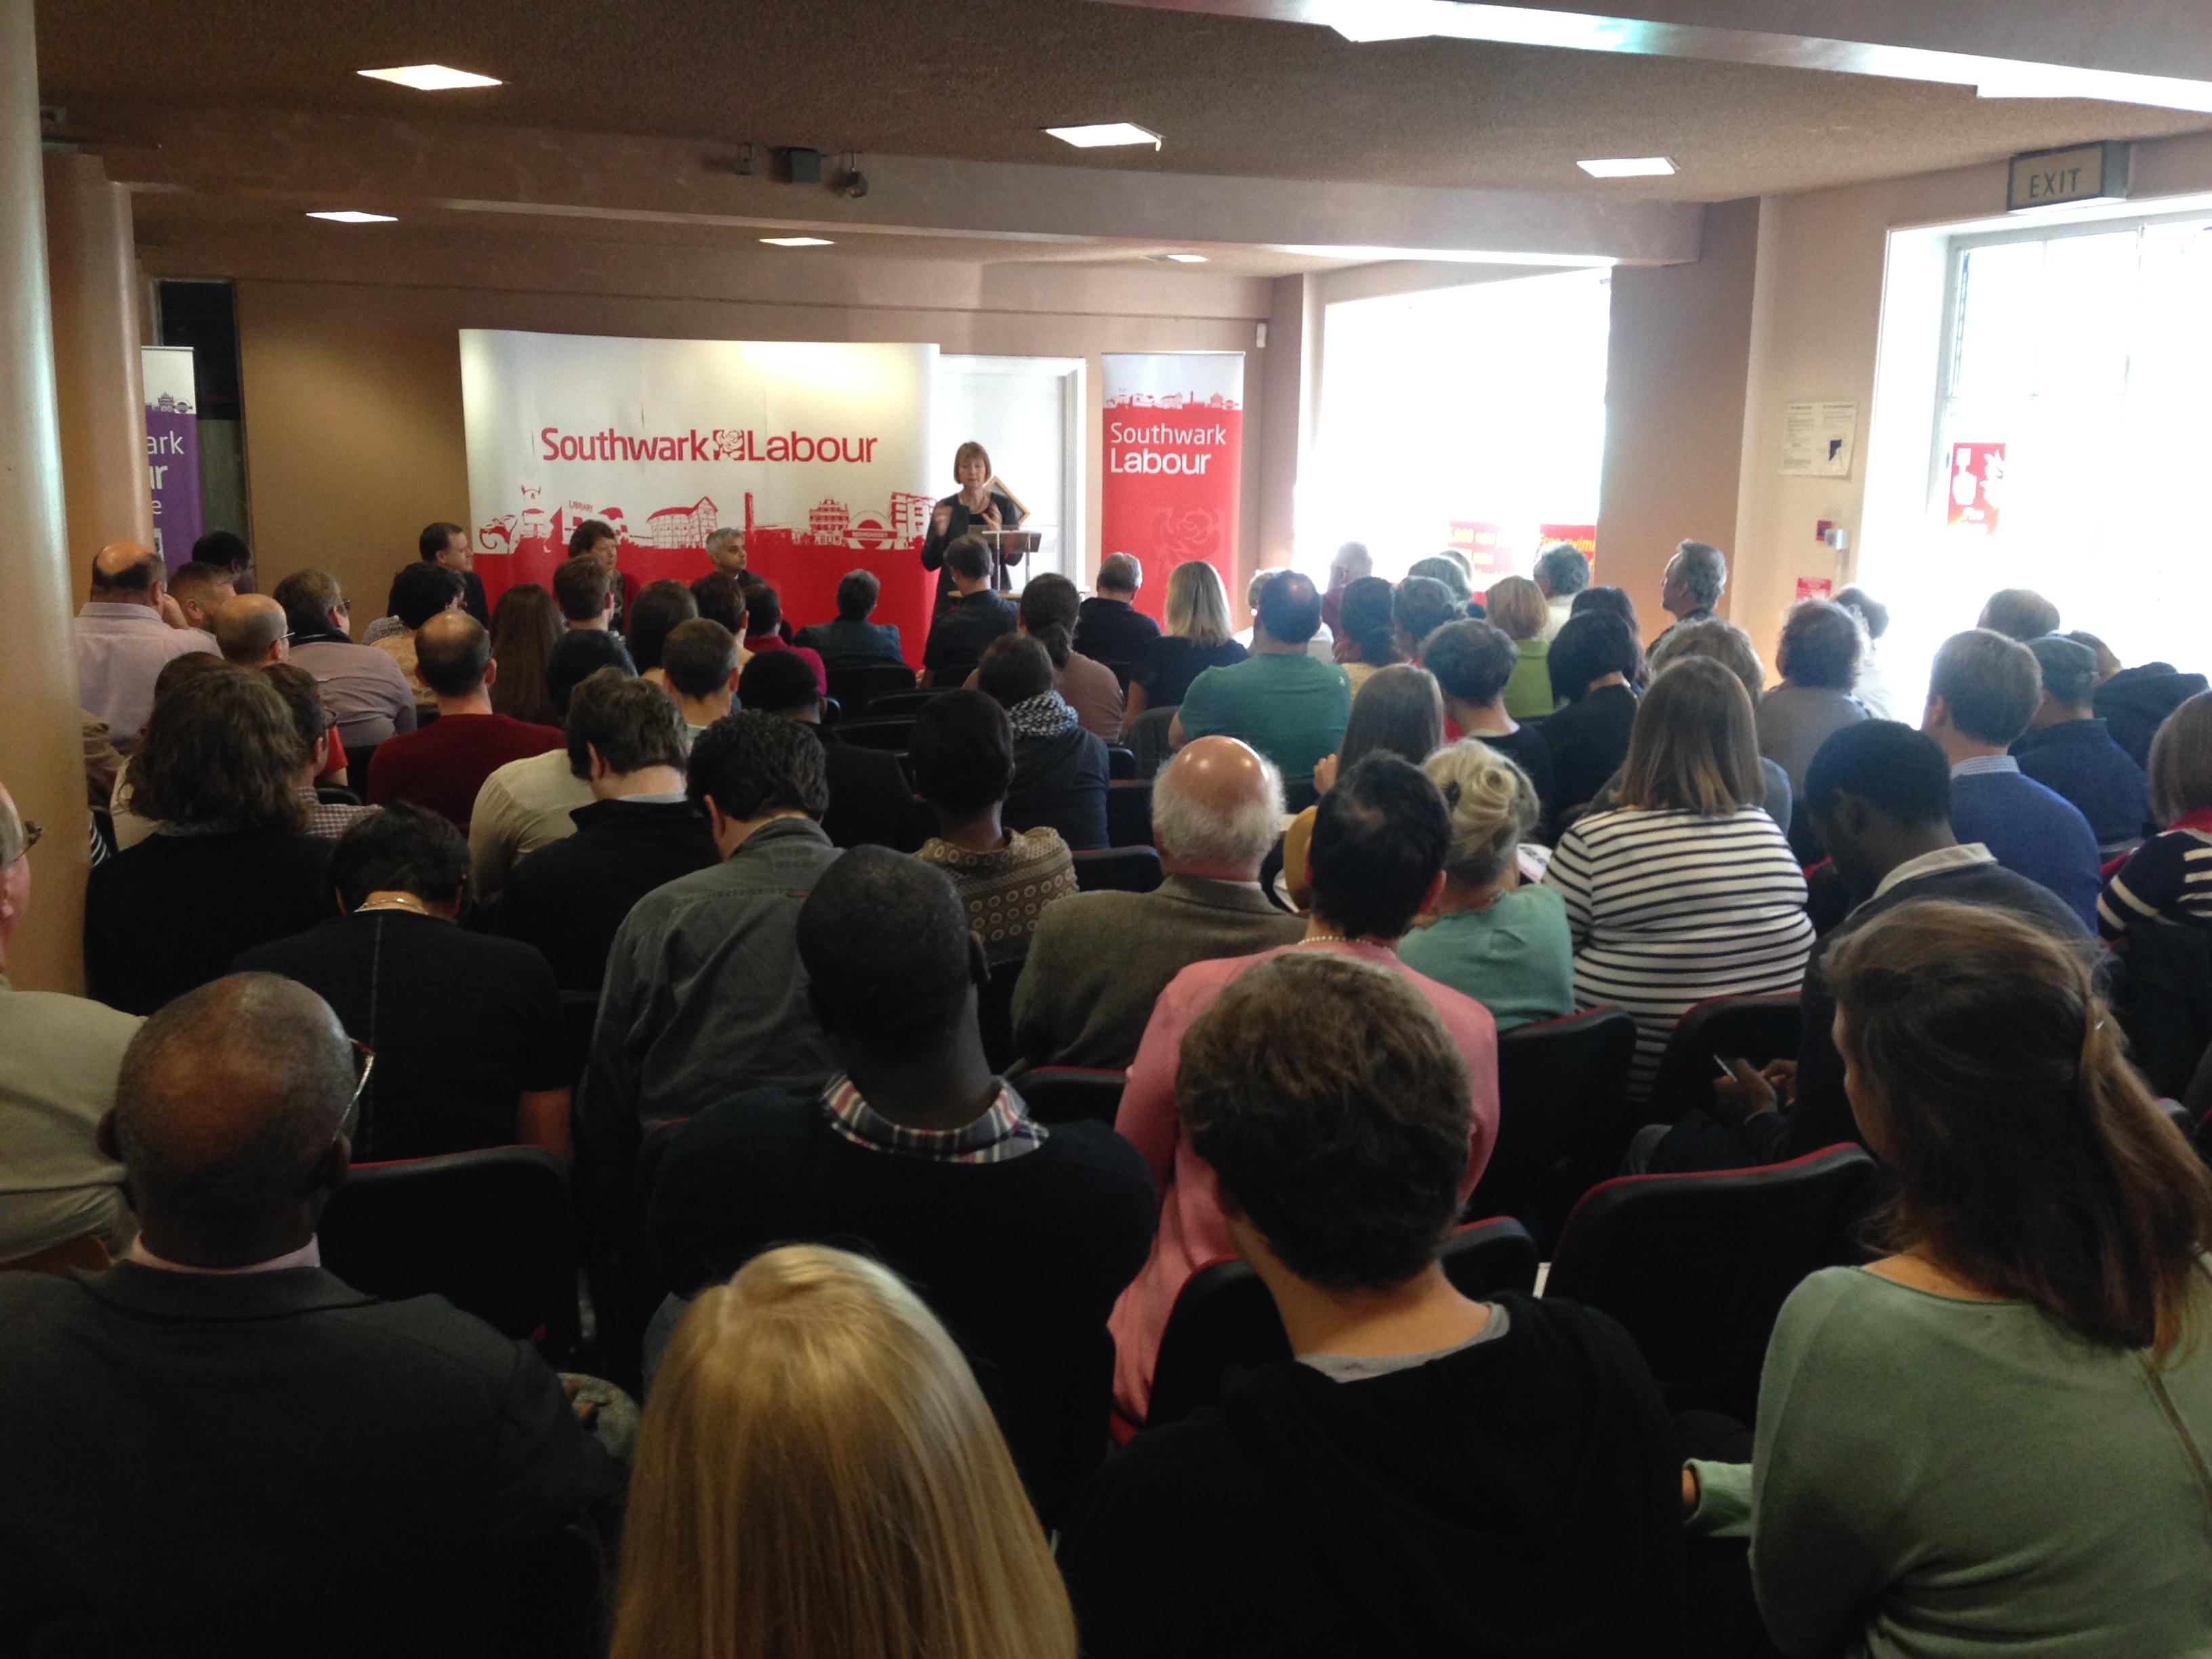 Crowd_Southwark_Conf_2015.jpg